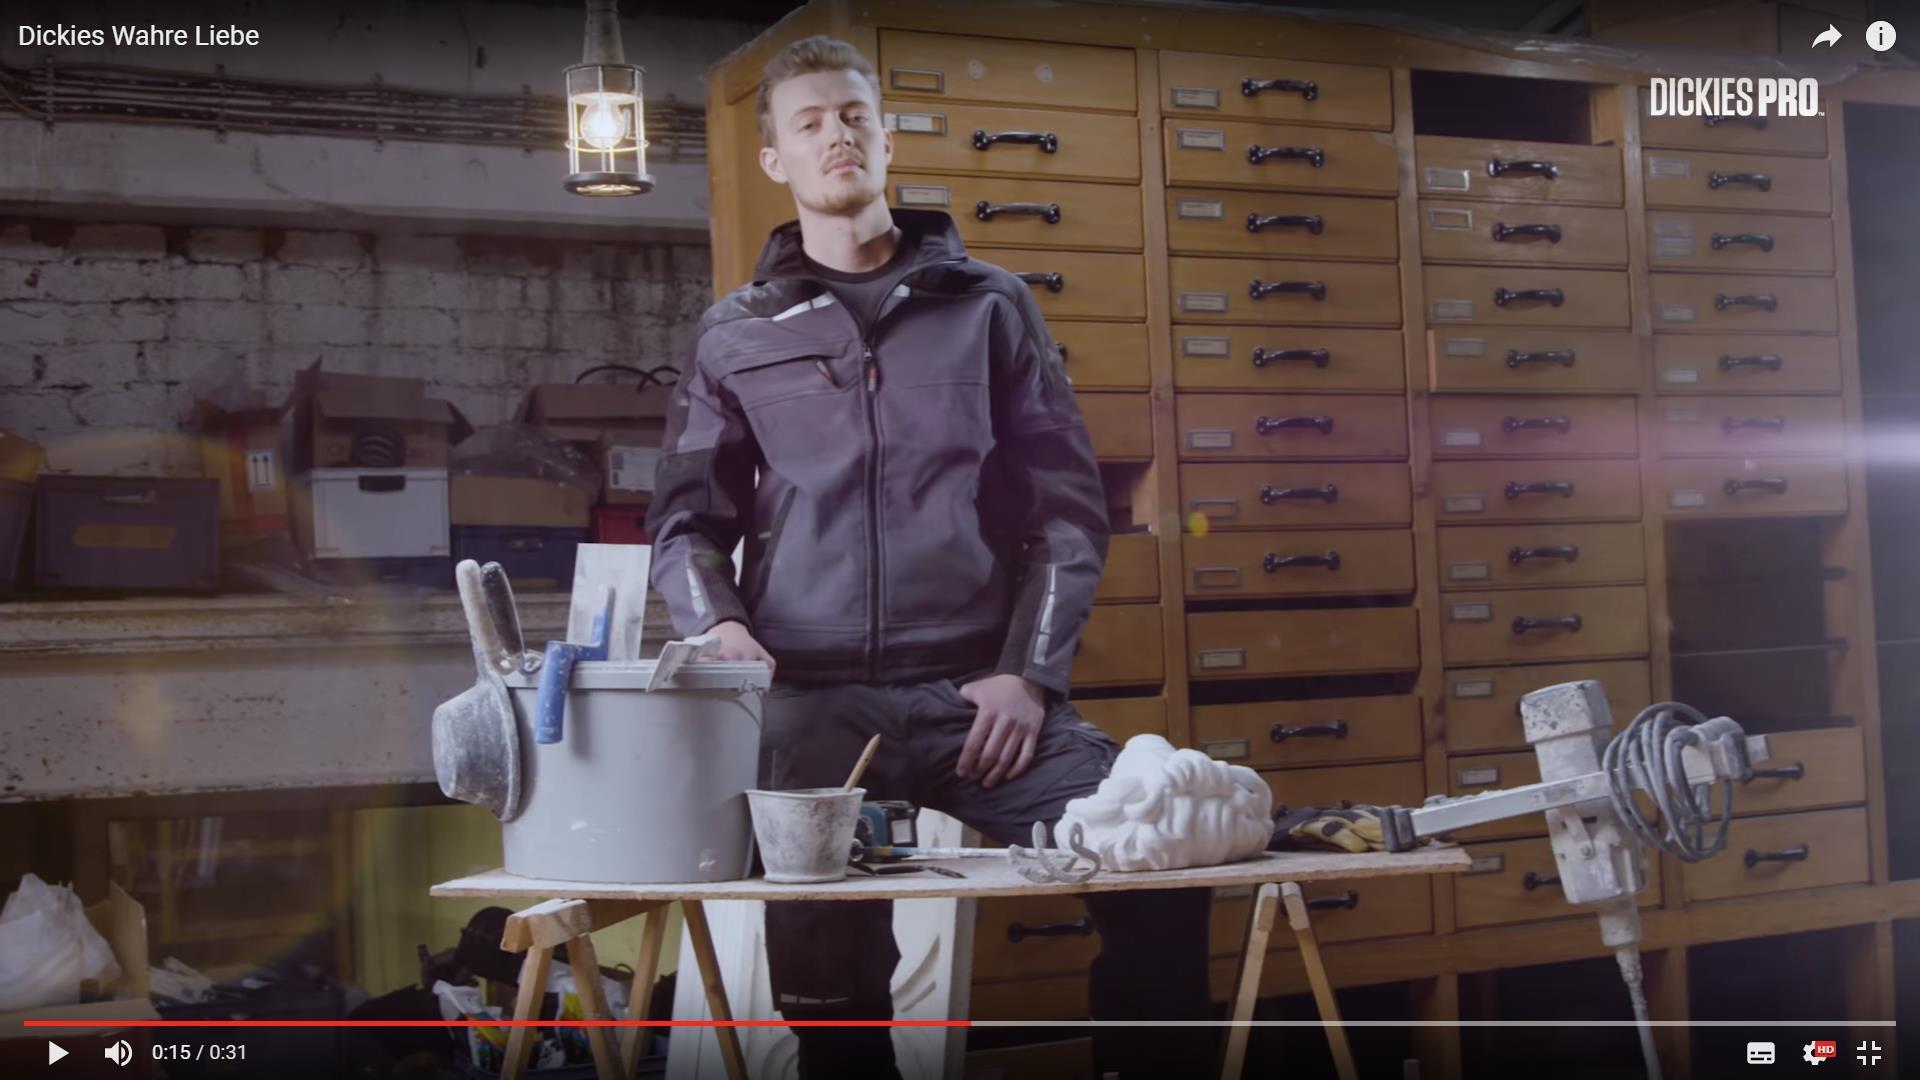 Dickies Wahre Liebe Bewegtbildstrategie Videokampagne AdWords Distribution Online Social Media Film YouTube Daten